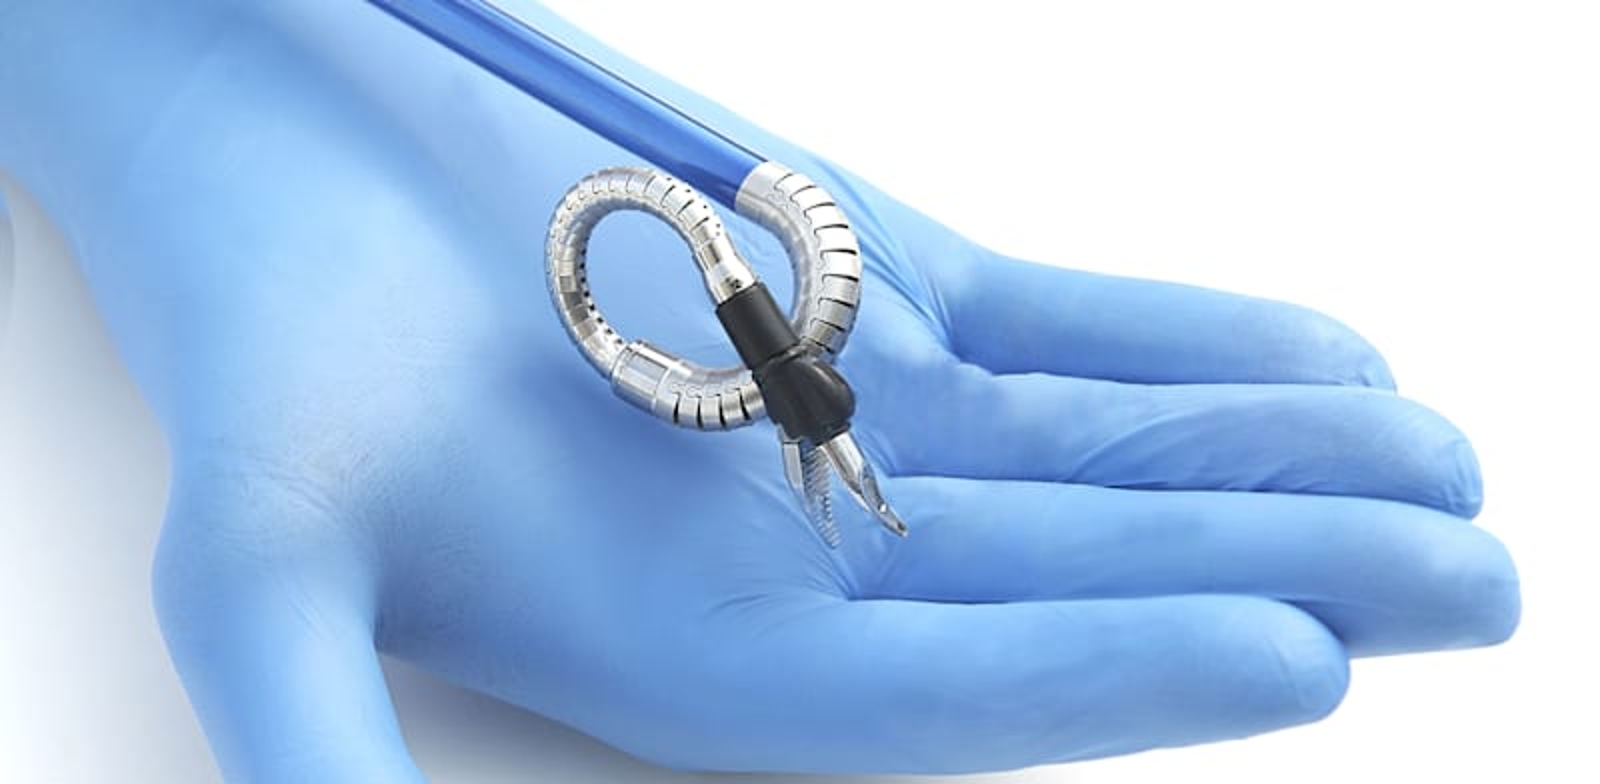 Memic Innovative Surgery device  credit: Memic